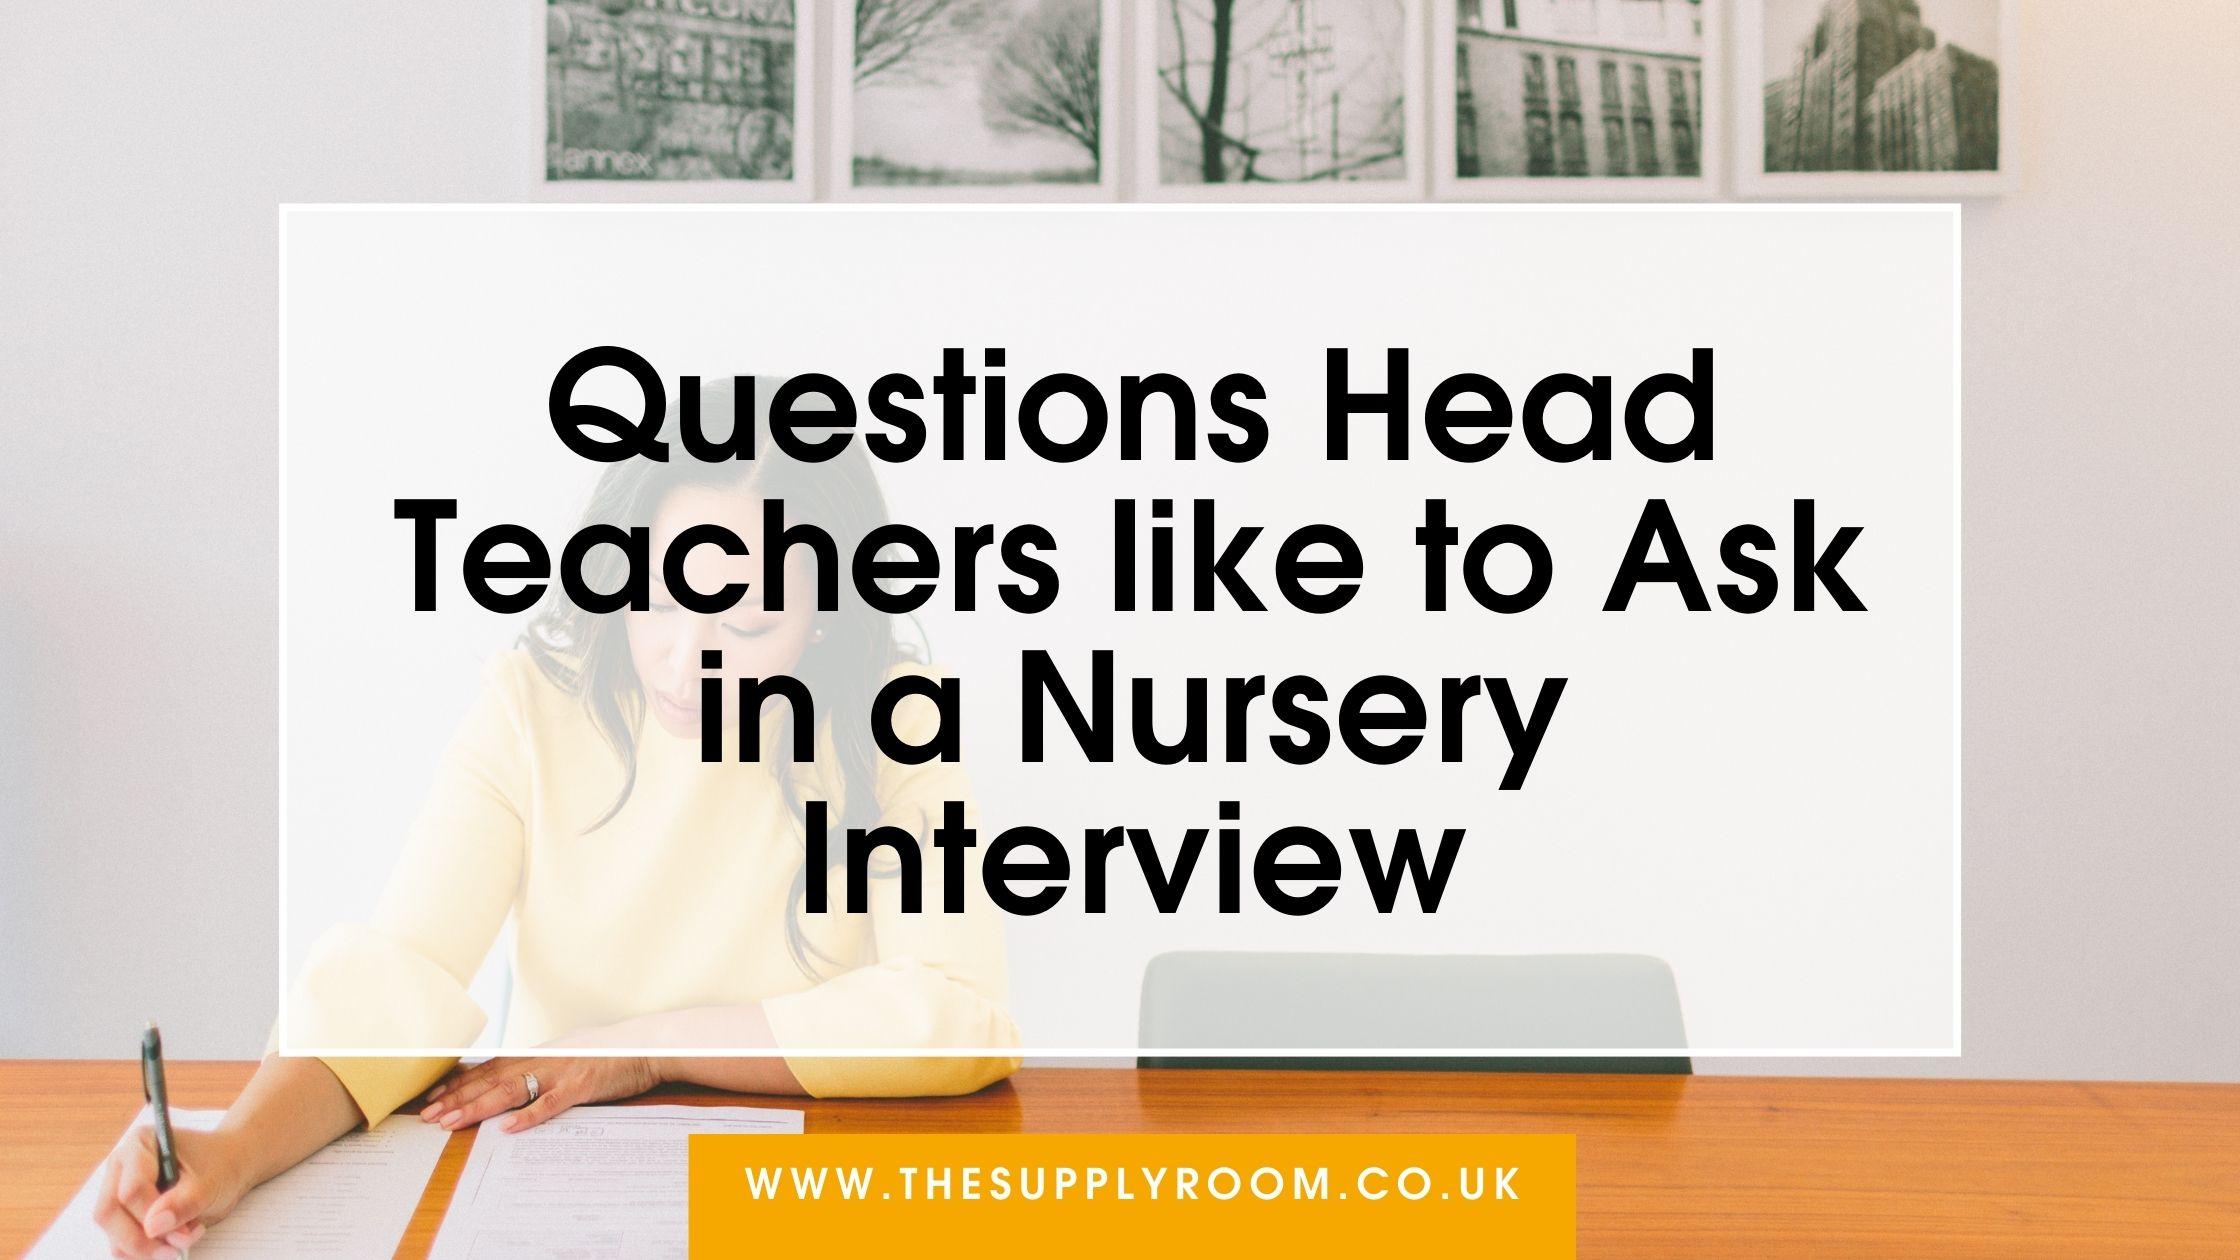 Questions Head Teachers Ask in a Nursery Interview